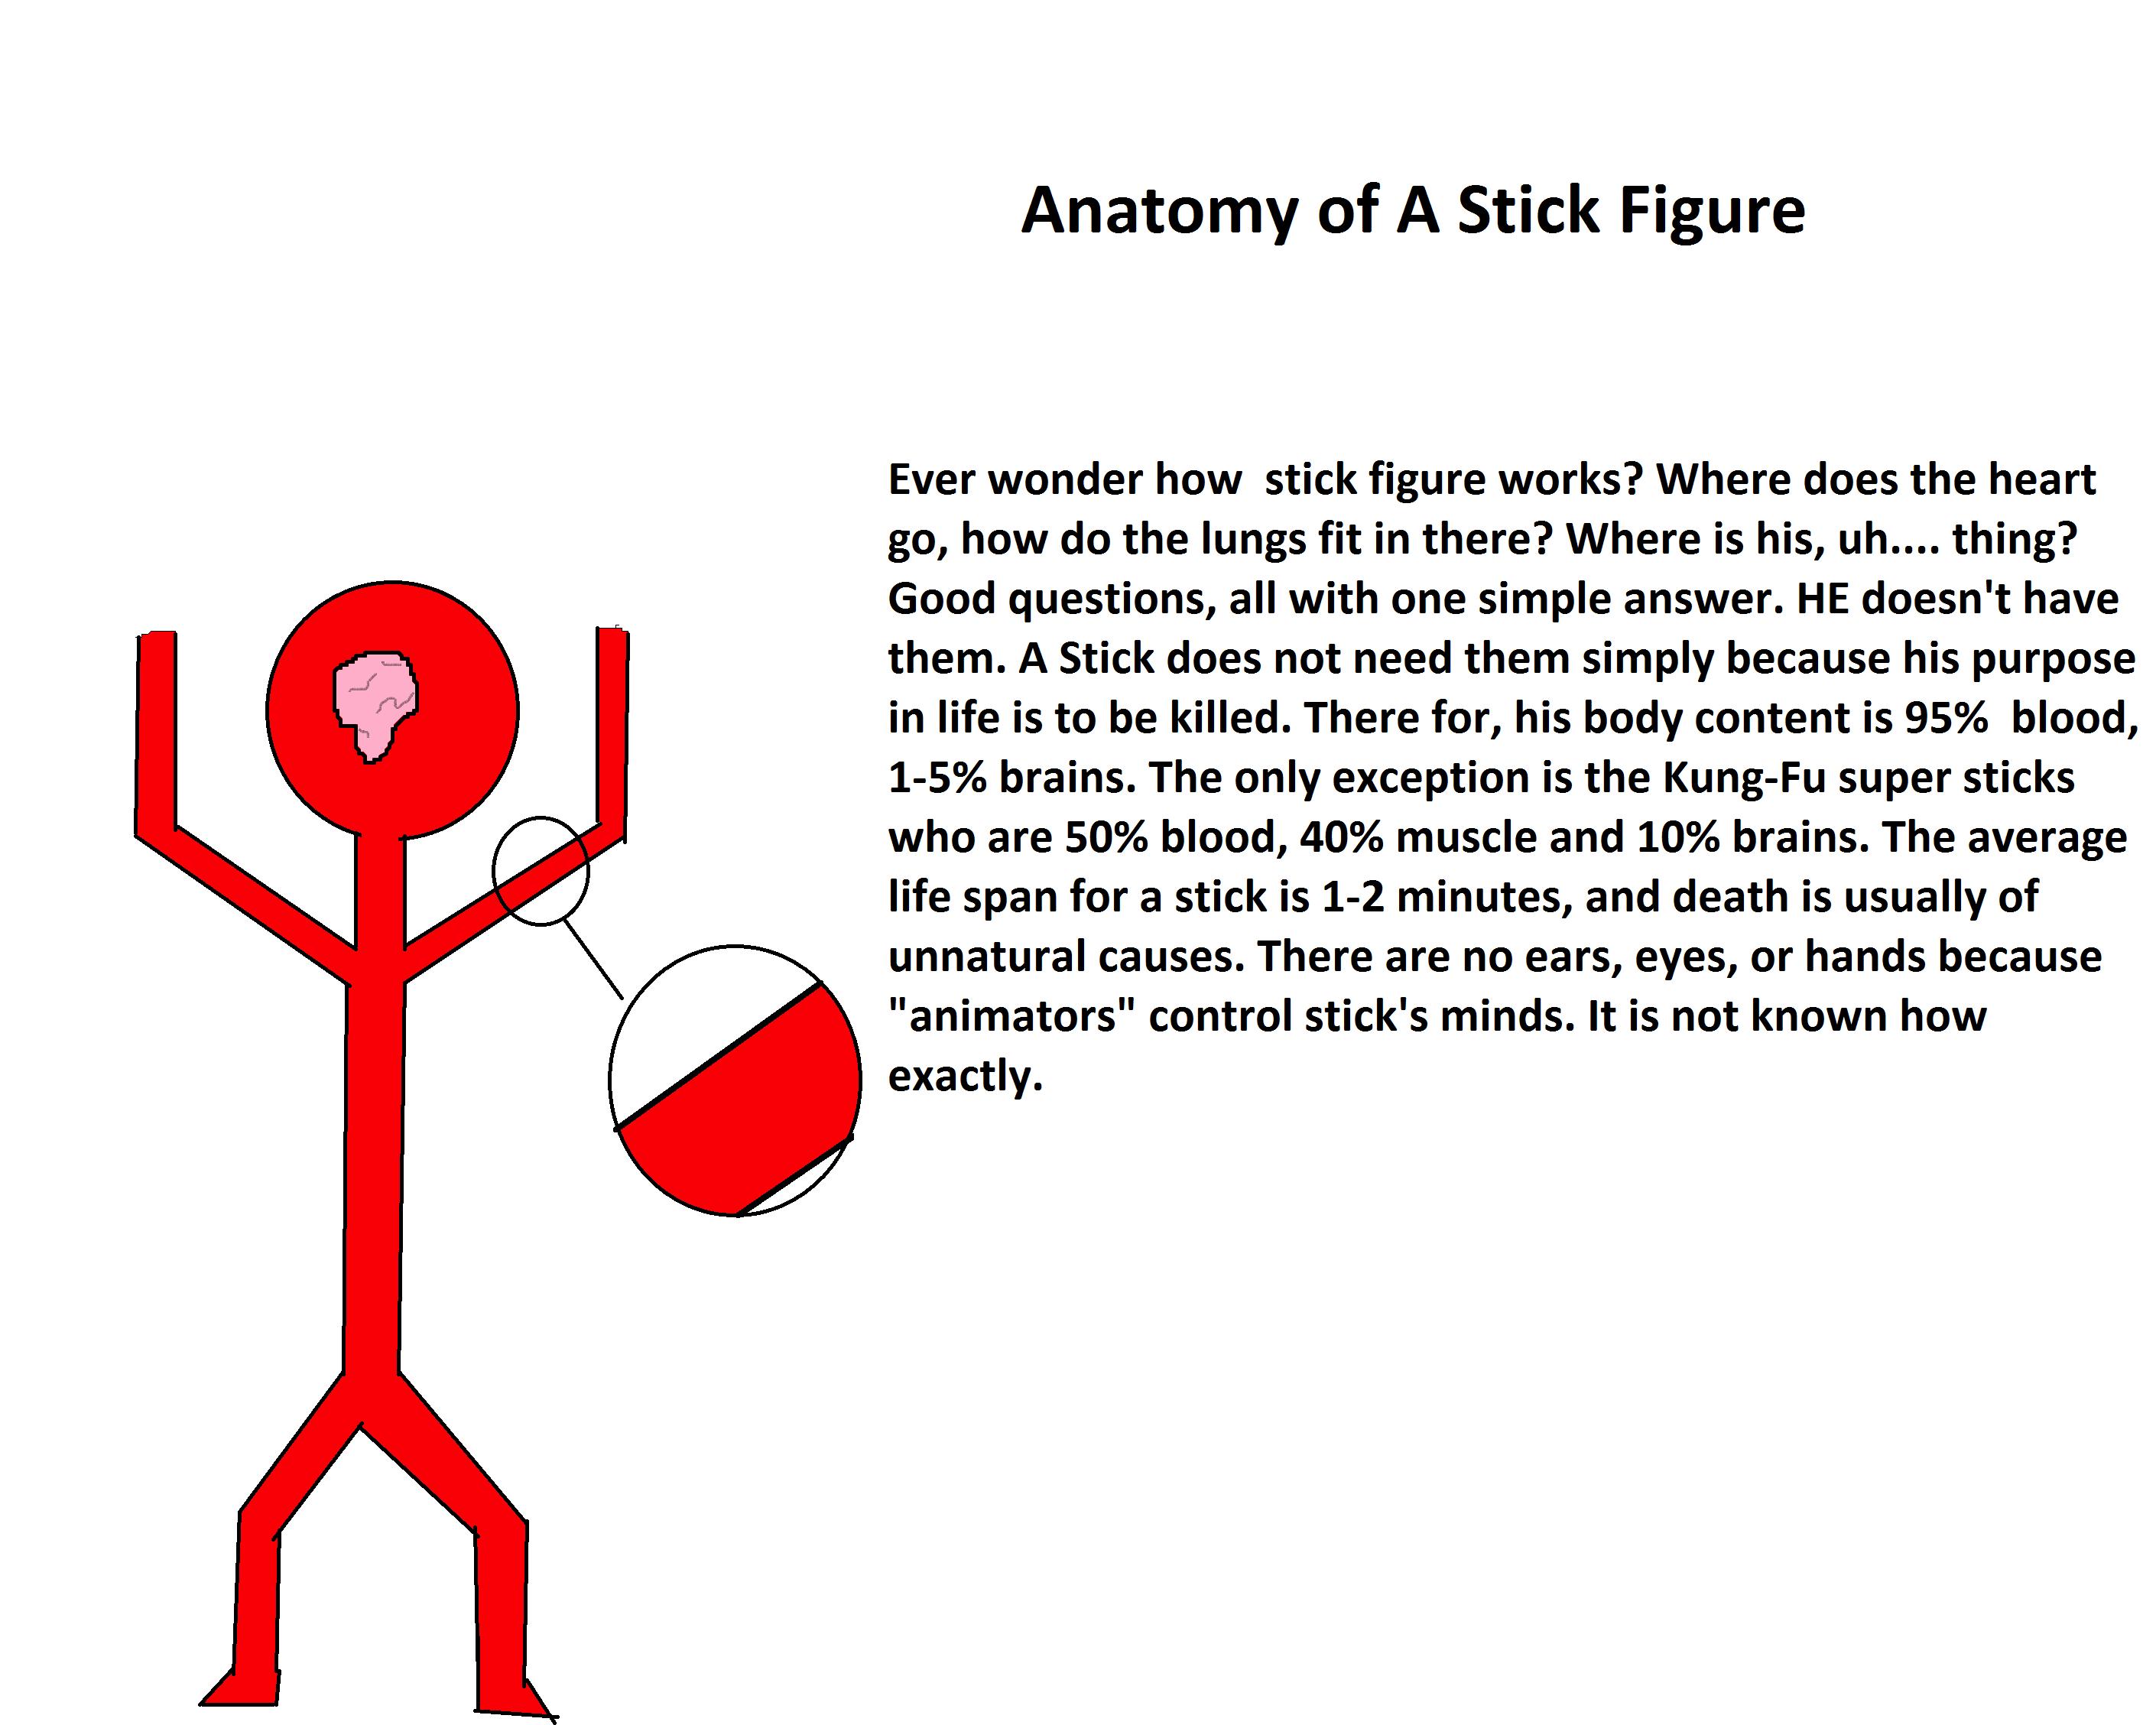 Anatomy of a Stick